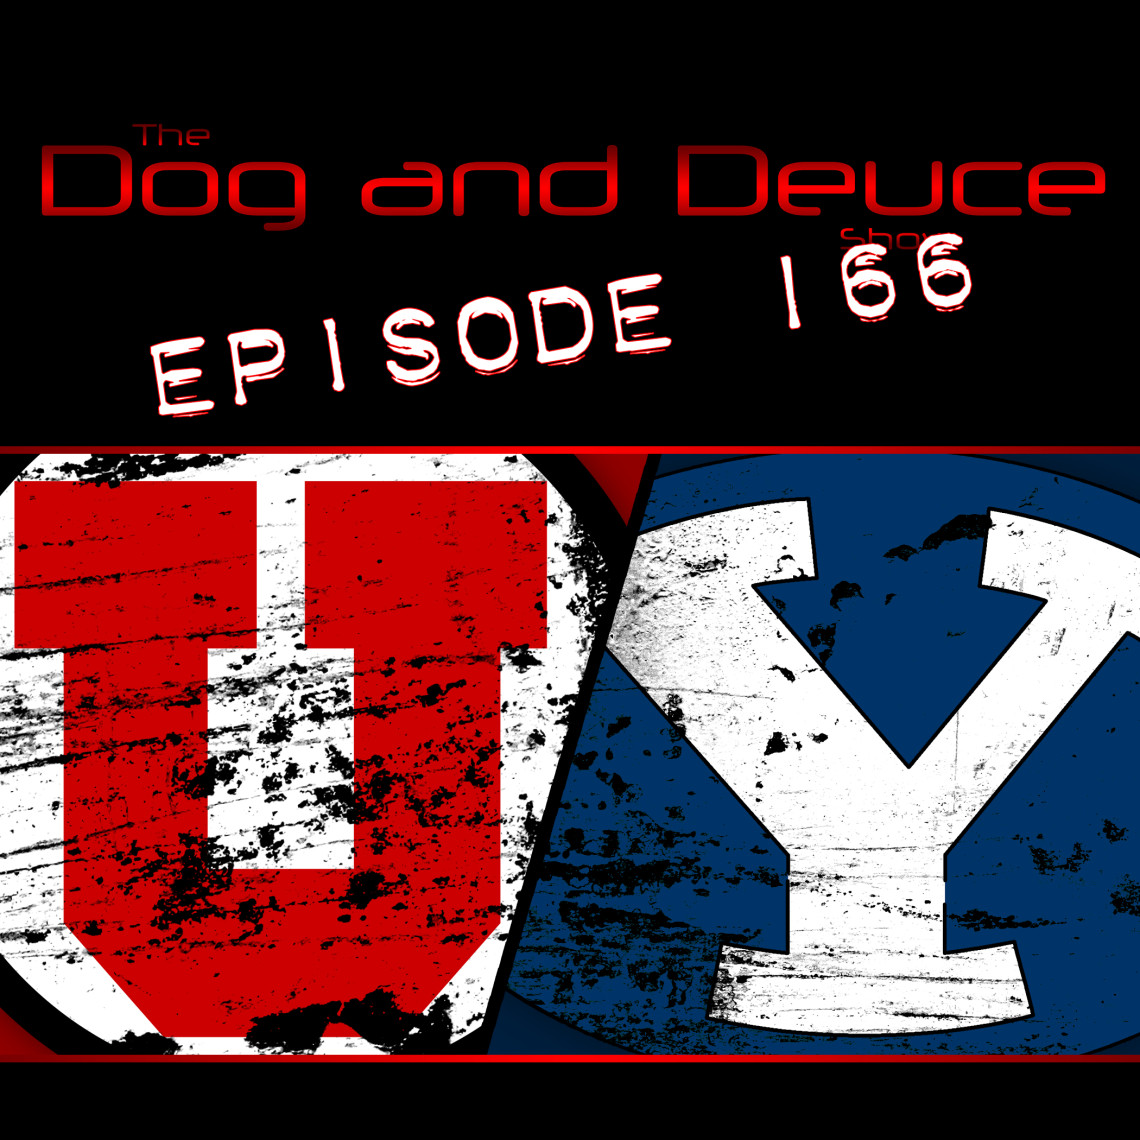 Dog and Deuce #166